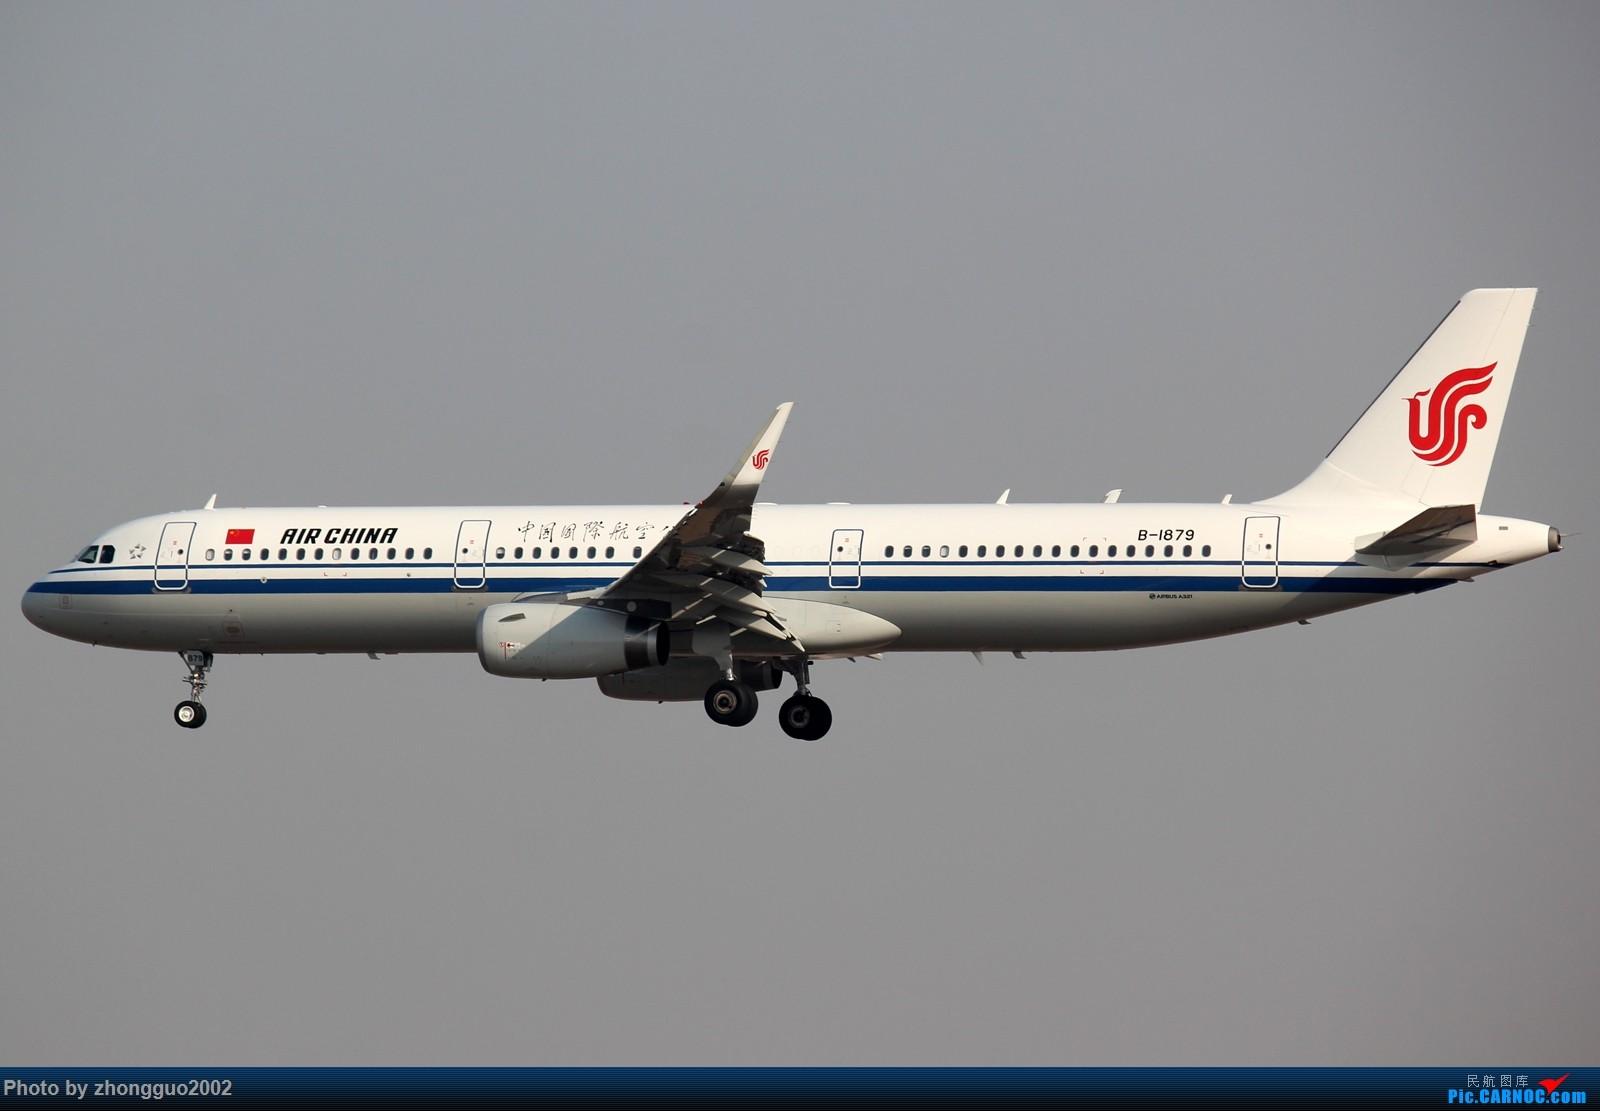 Re:[原创]【BLDDQ--深圳打机队】发小飞机盖楼贴,凡跟帖1字开头大陆民航飞机图的,每图五架小飞机不重复 AIRBUS A321-200 B-1879 中国北京首都国际机场